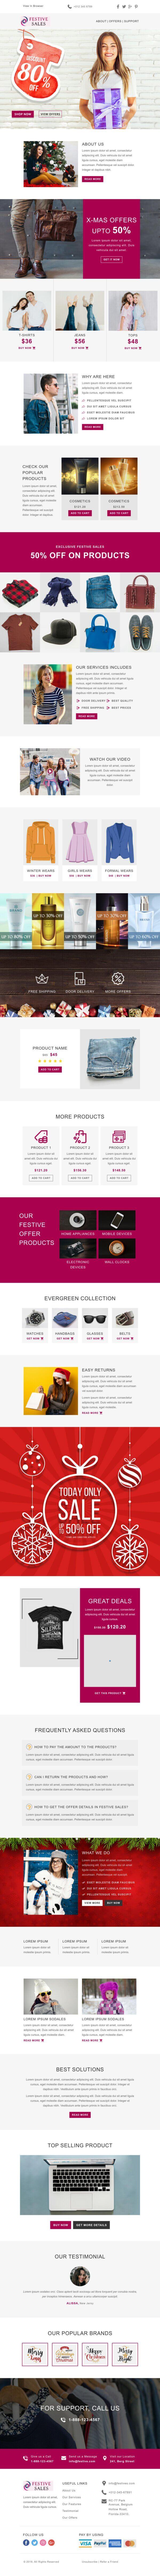 Festive Sales